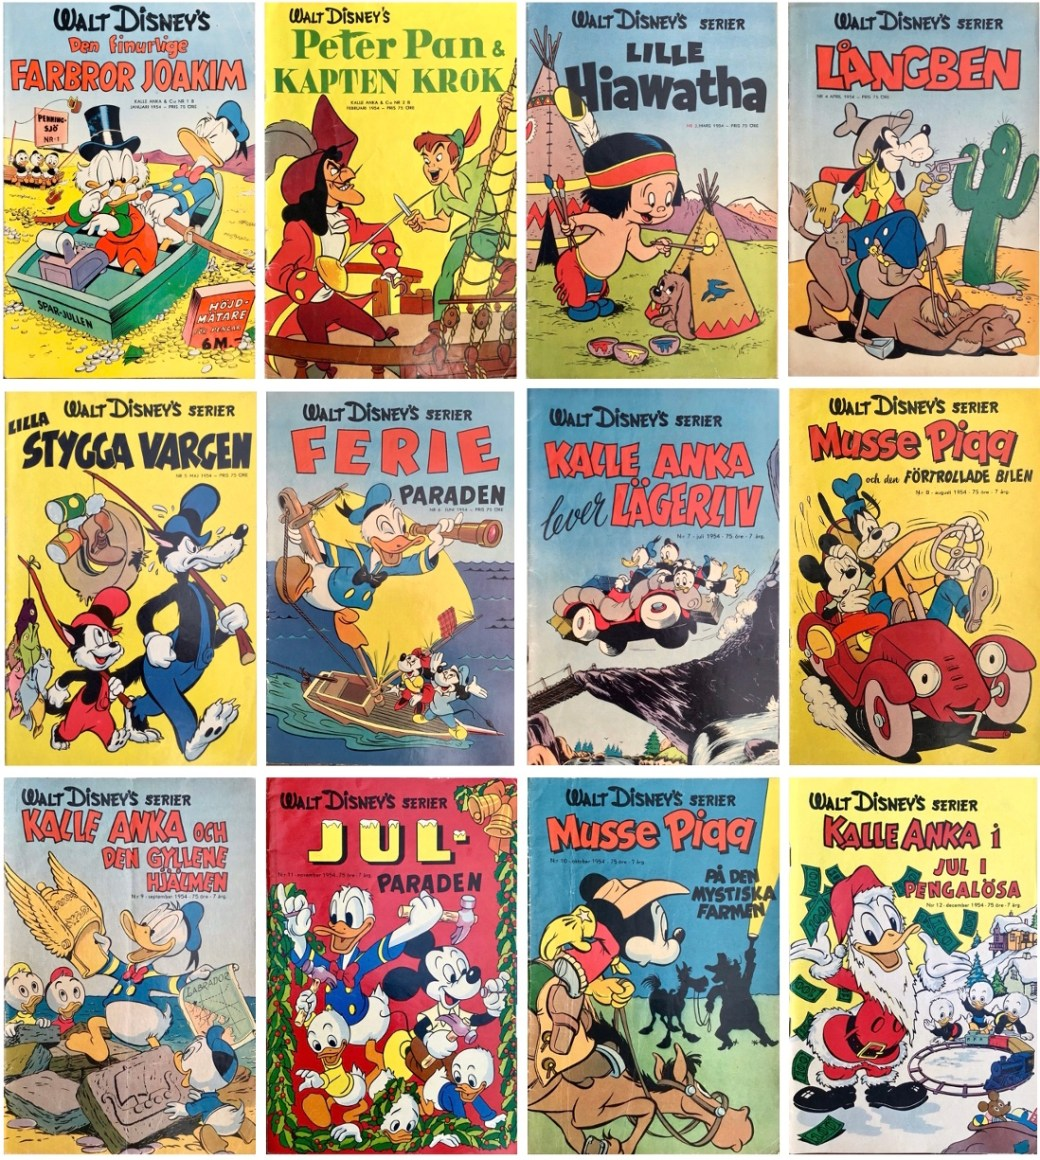 Omslag till Walt Disney's serier 1954. ©Richters/Disney